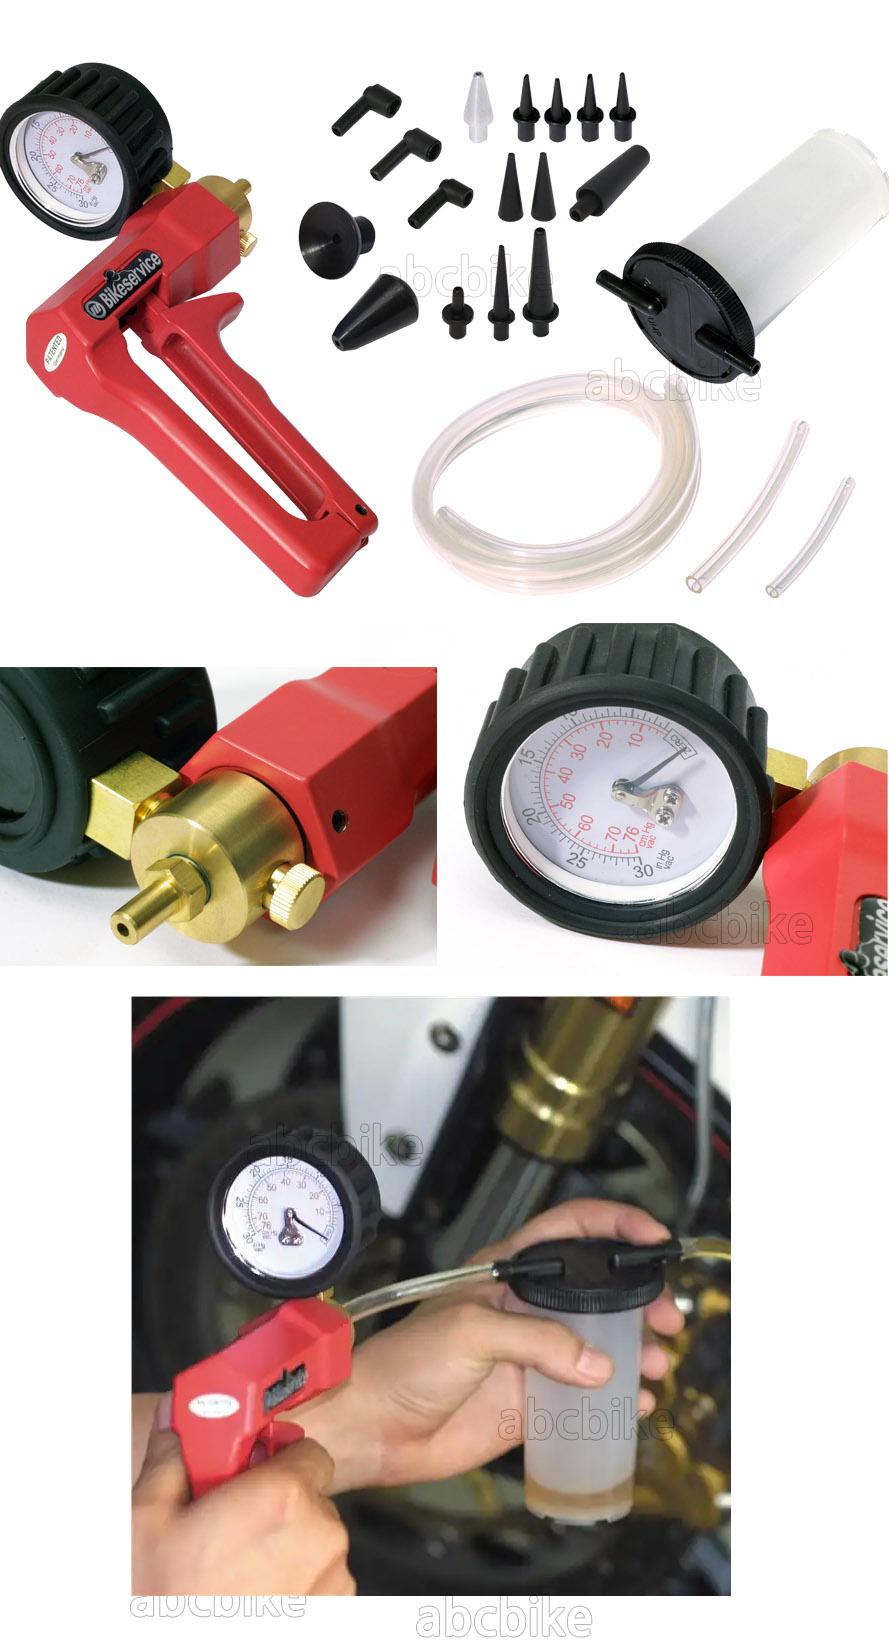 BIKESERVICE(바이크서비스) 진공 펌프 및 브레이크 브리더 키트( 브레이크액 교환기 ) BS5582